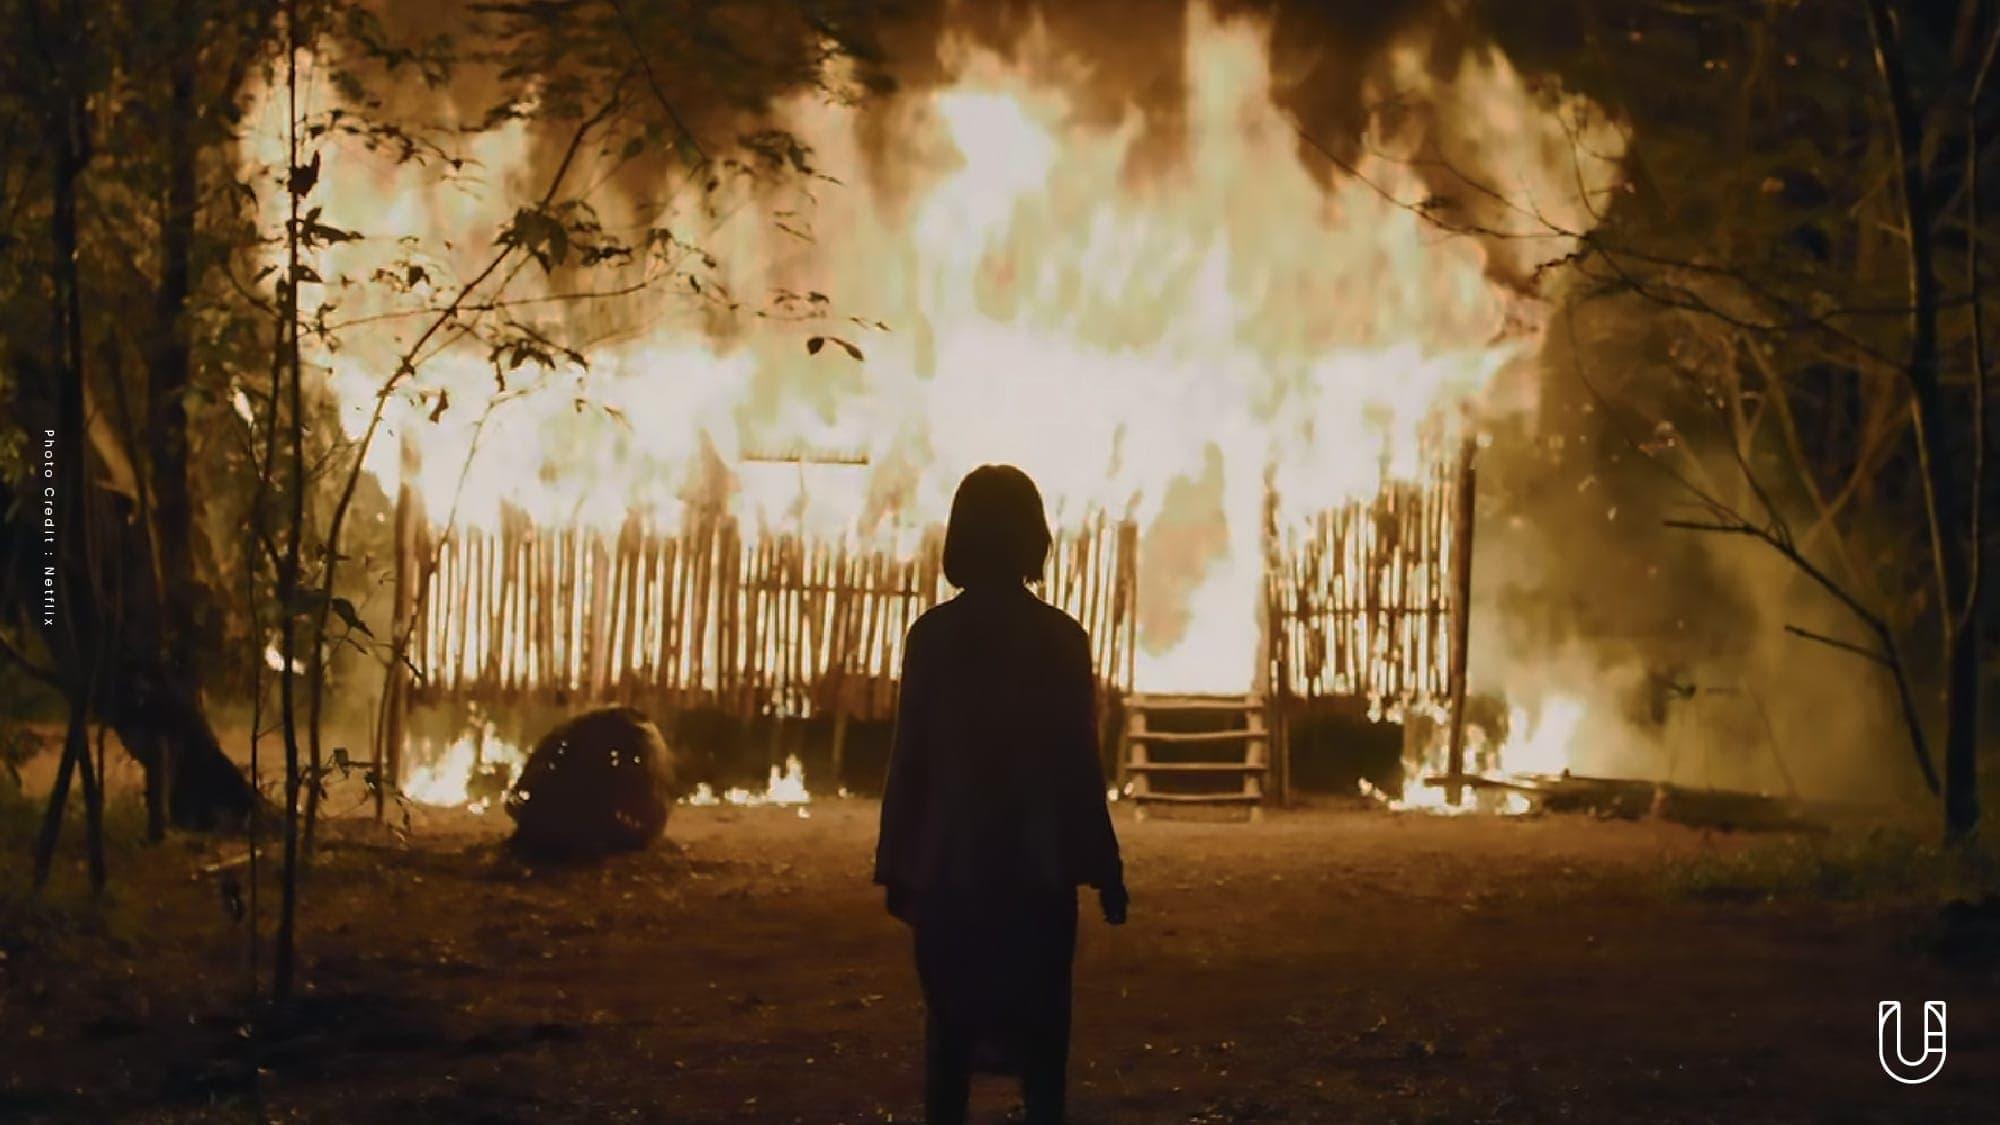 Roh หนังผีมาเลย์ บนเรื่องพื้นบ้านและพื้นเพศาสนา - Urban Creature